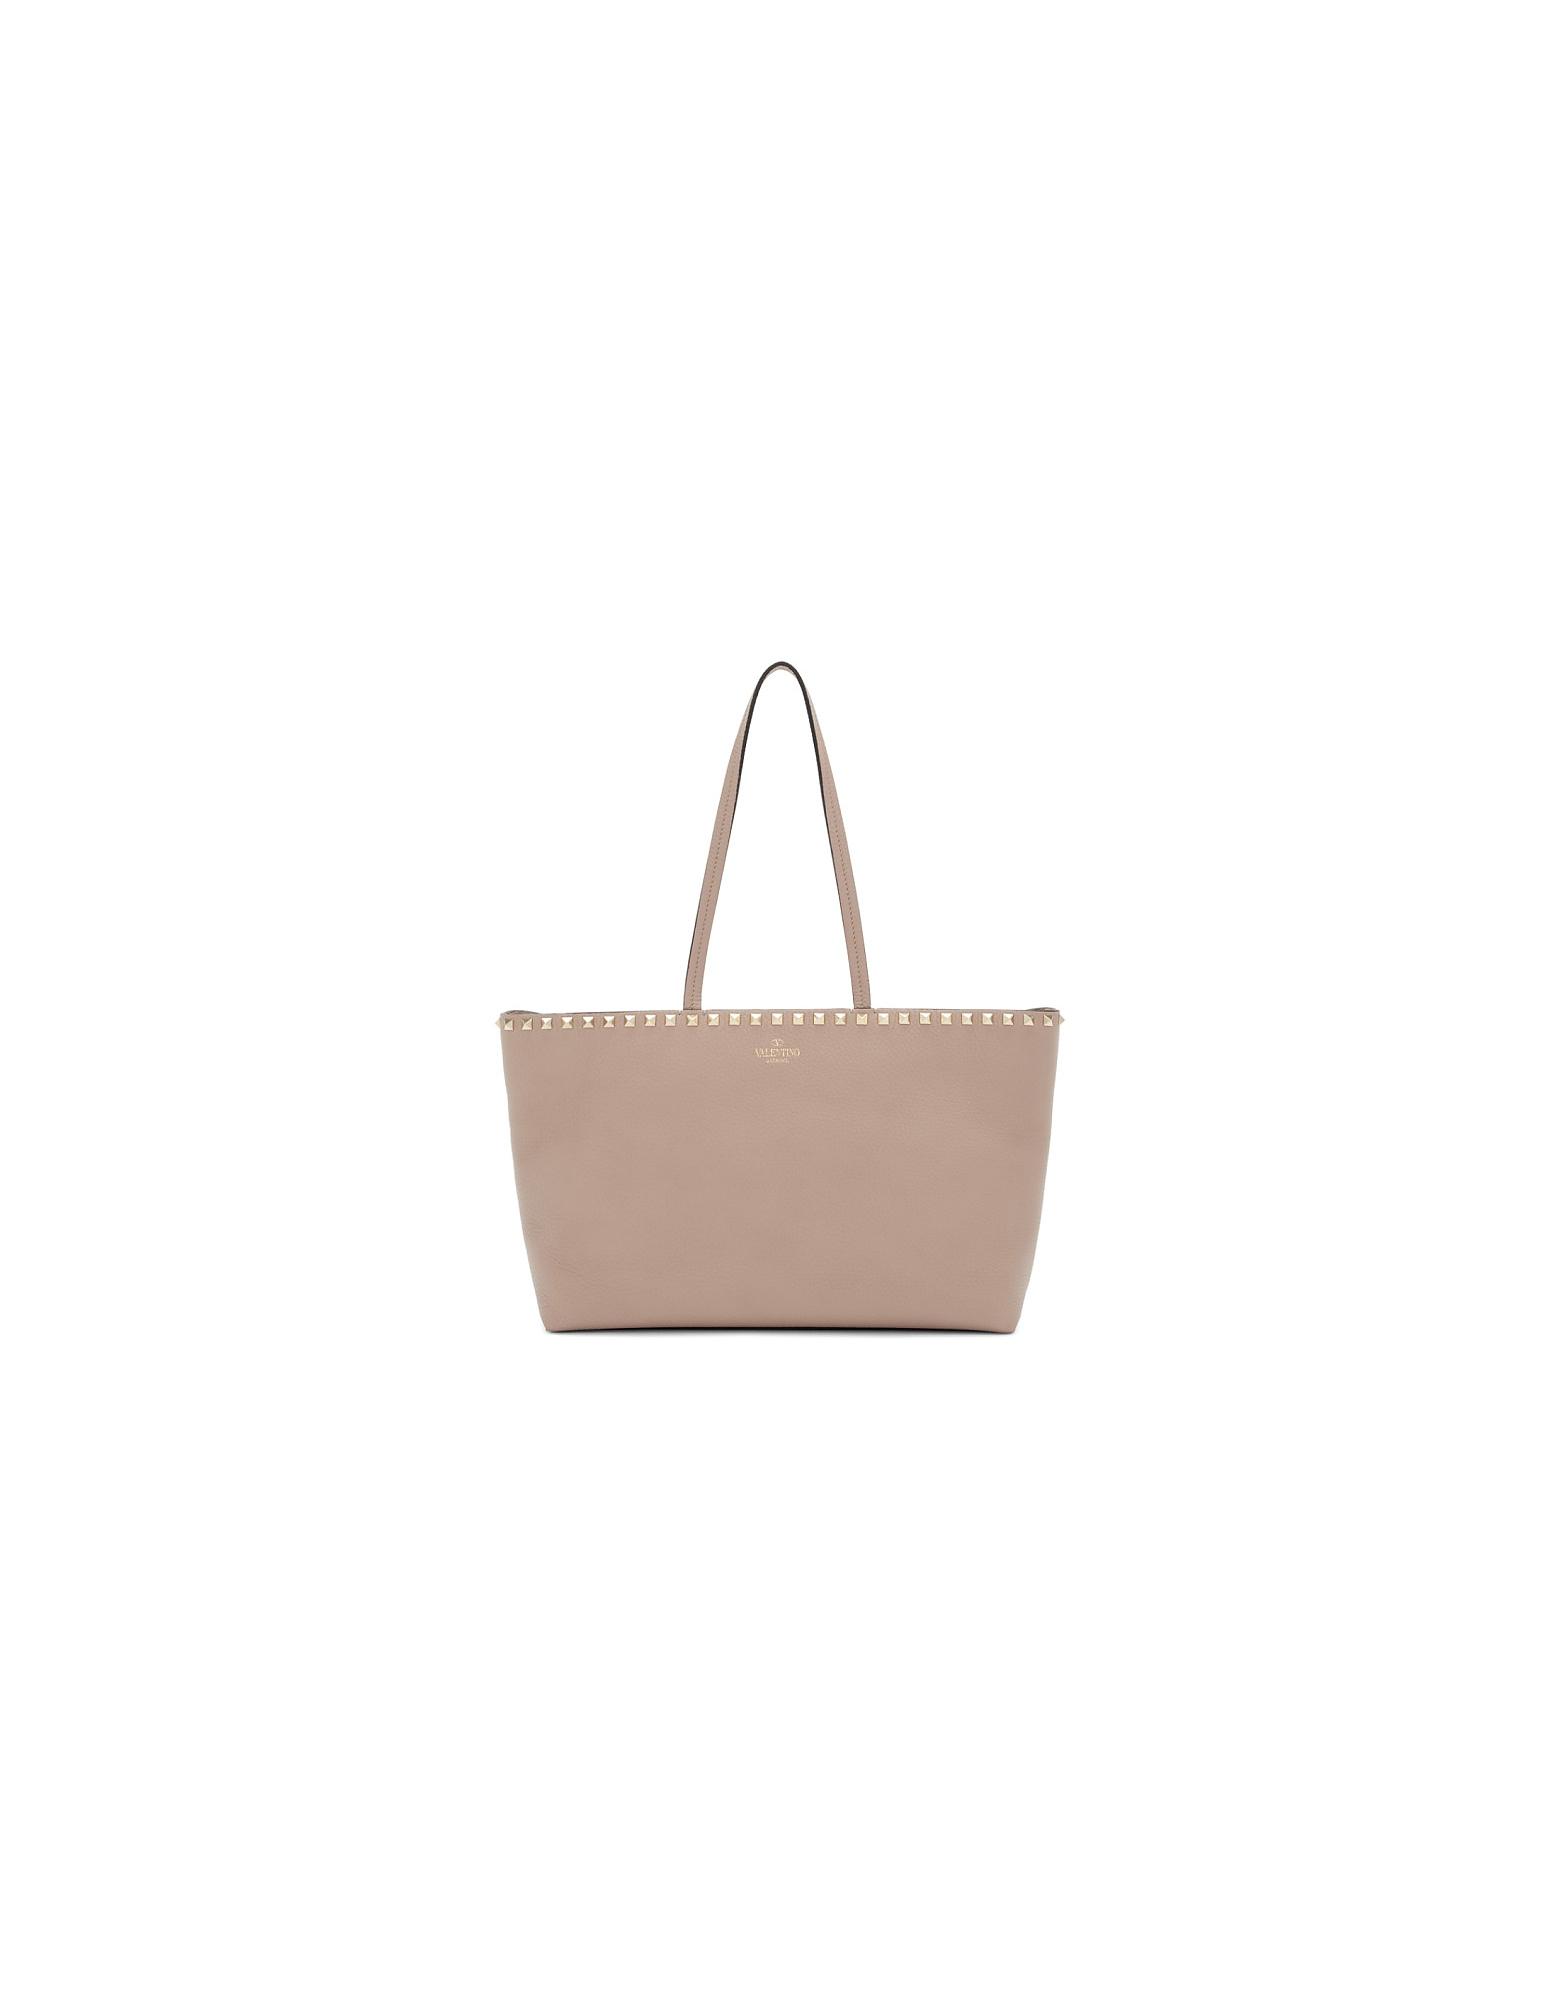 Valentino Designer Handbags, Pink Valentino Garavani Small Rockstud Shopper Tote